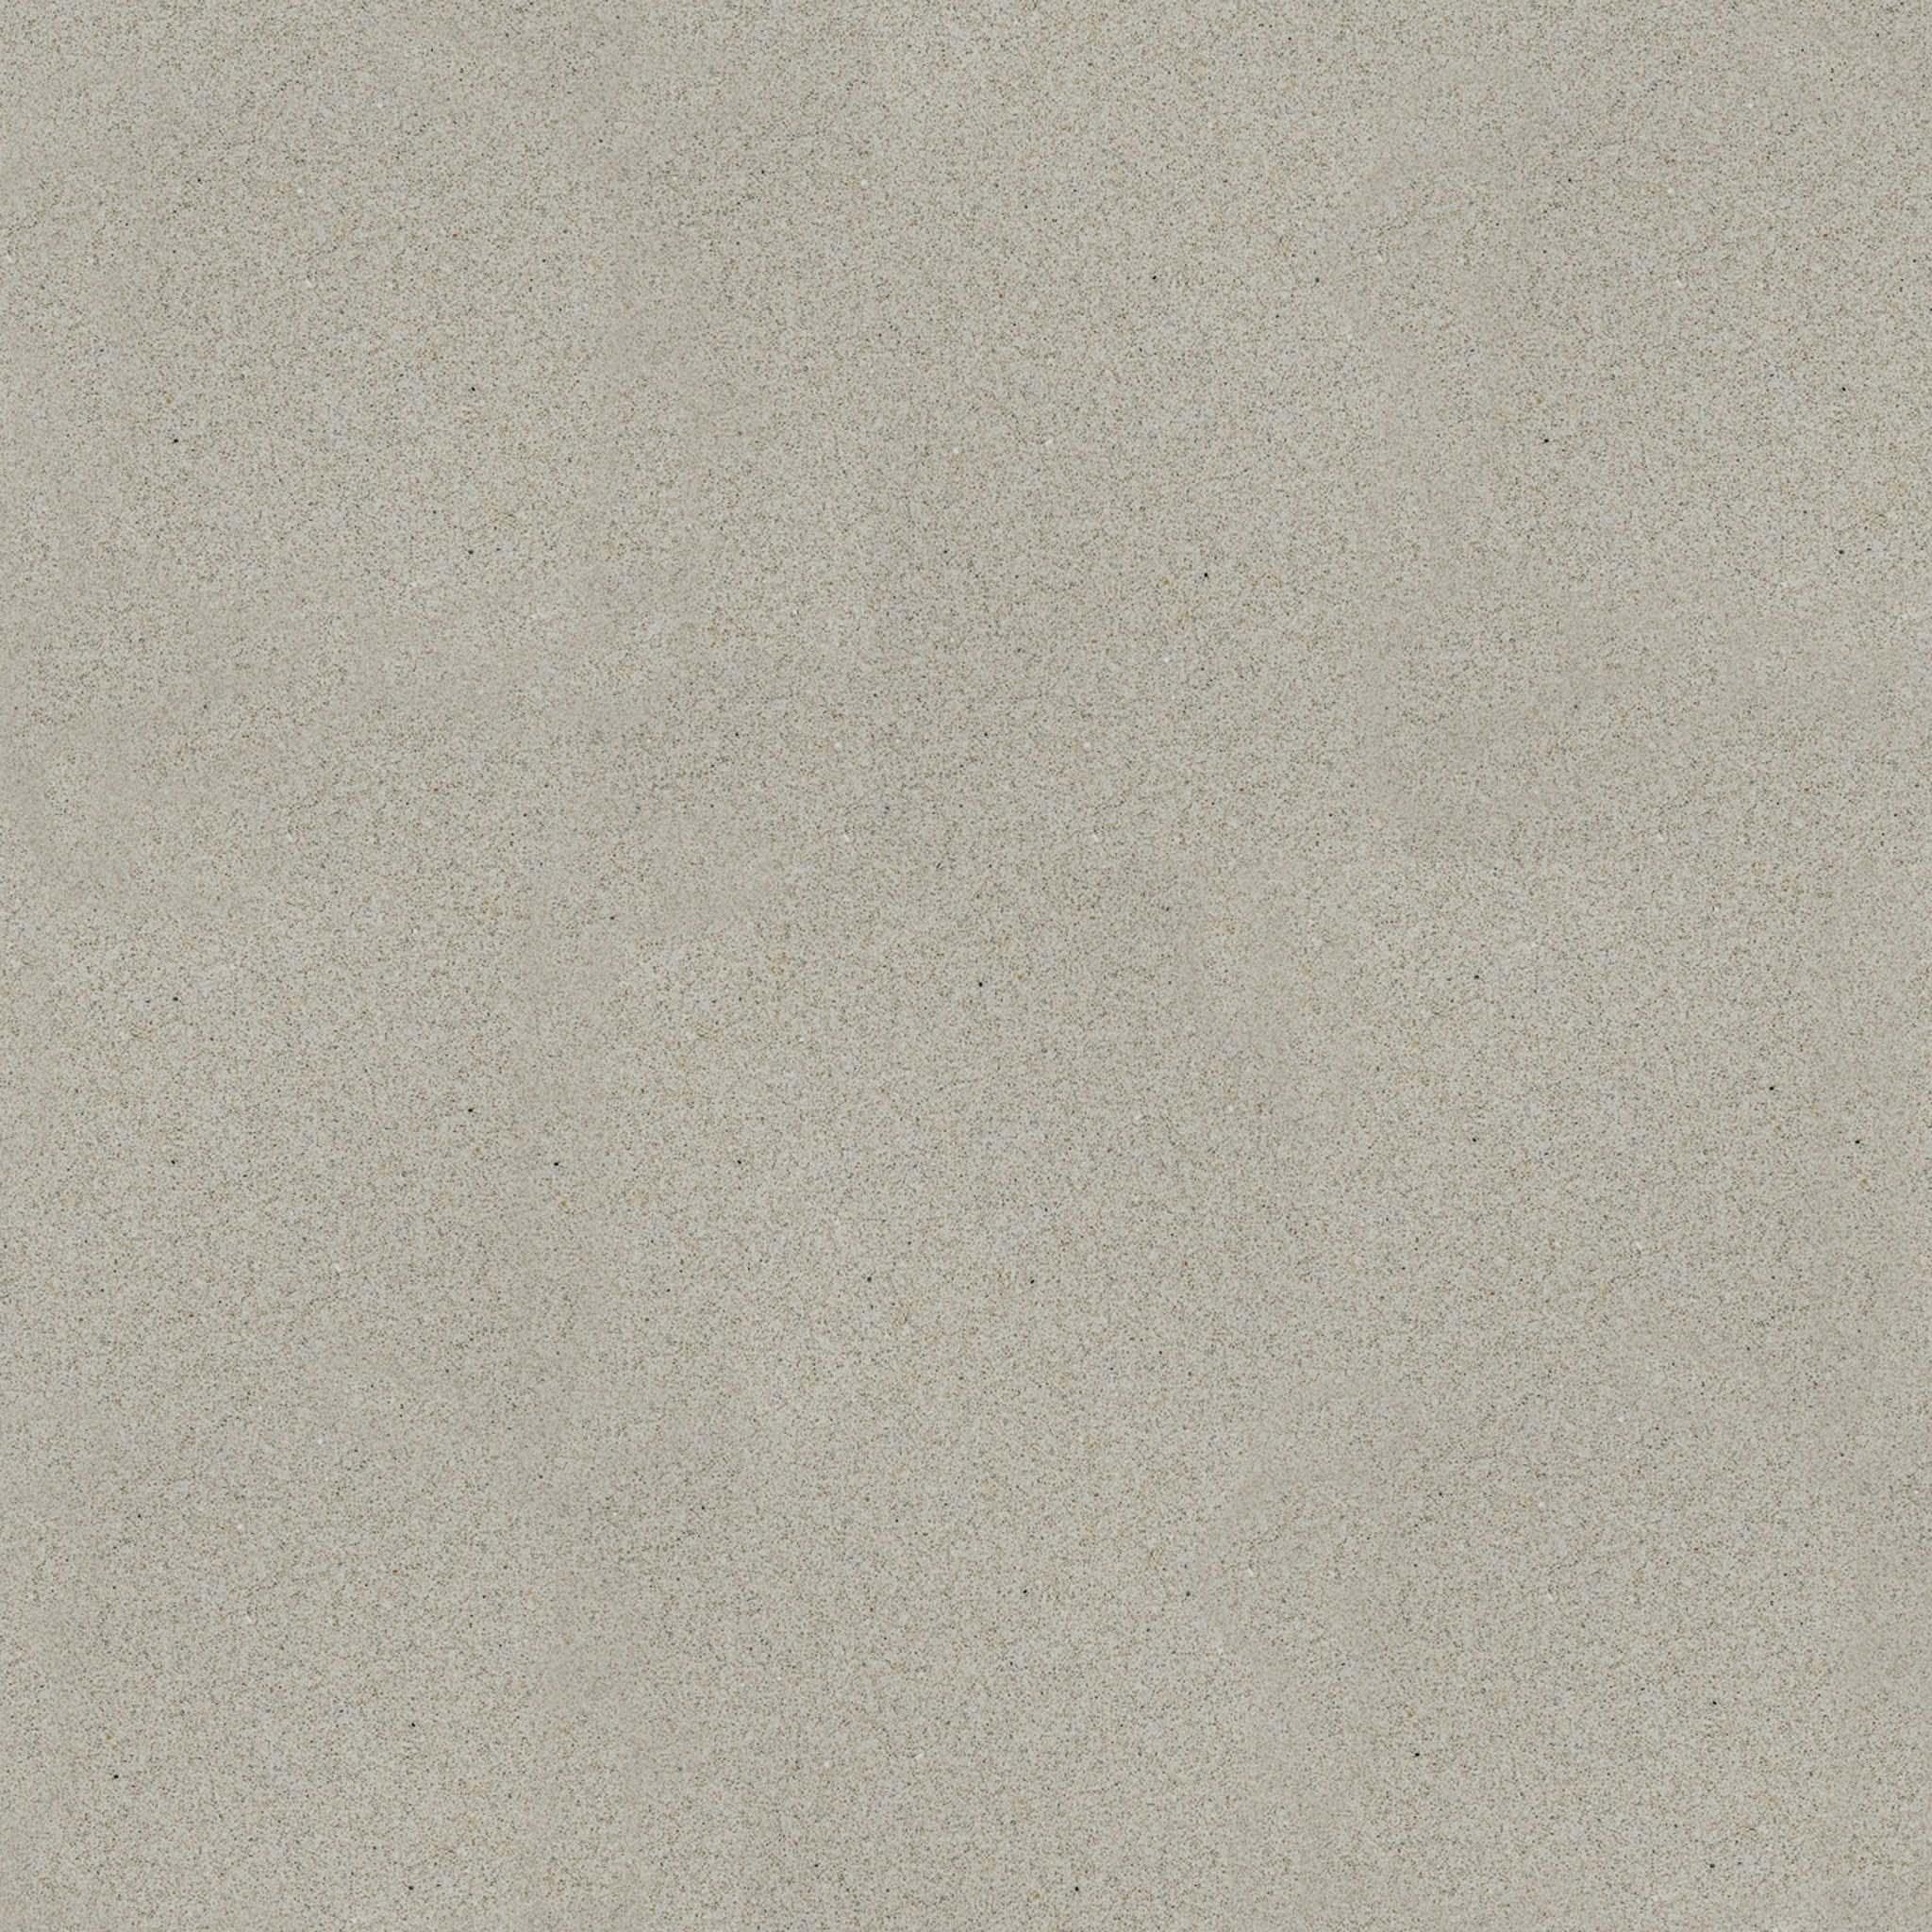 Ref 660 Pietra Serena